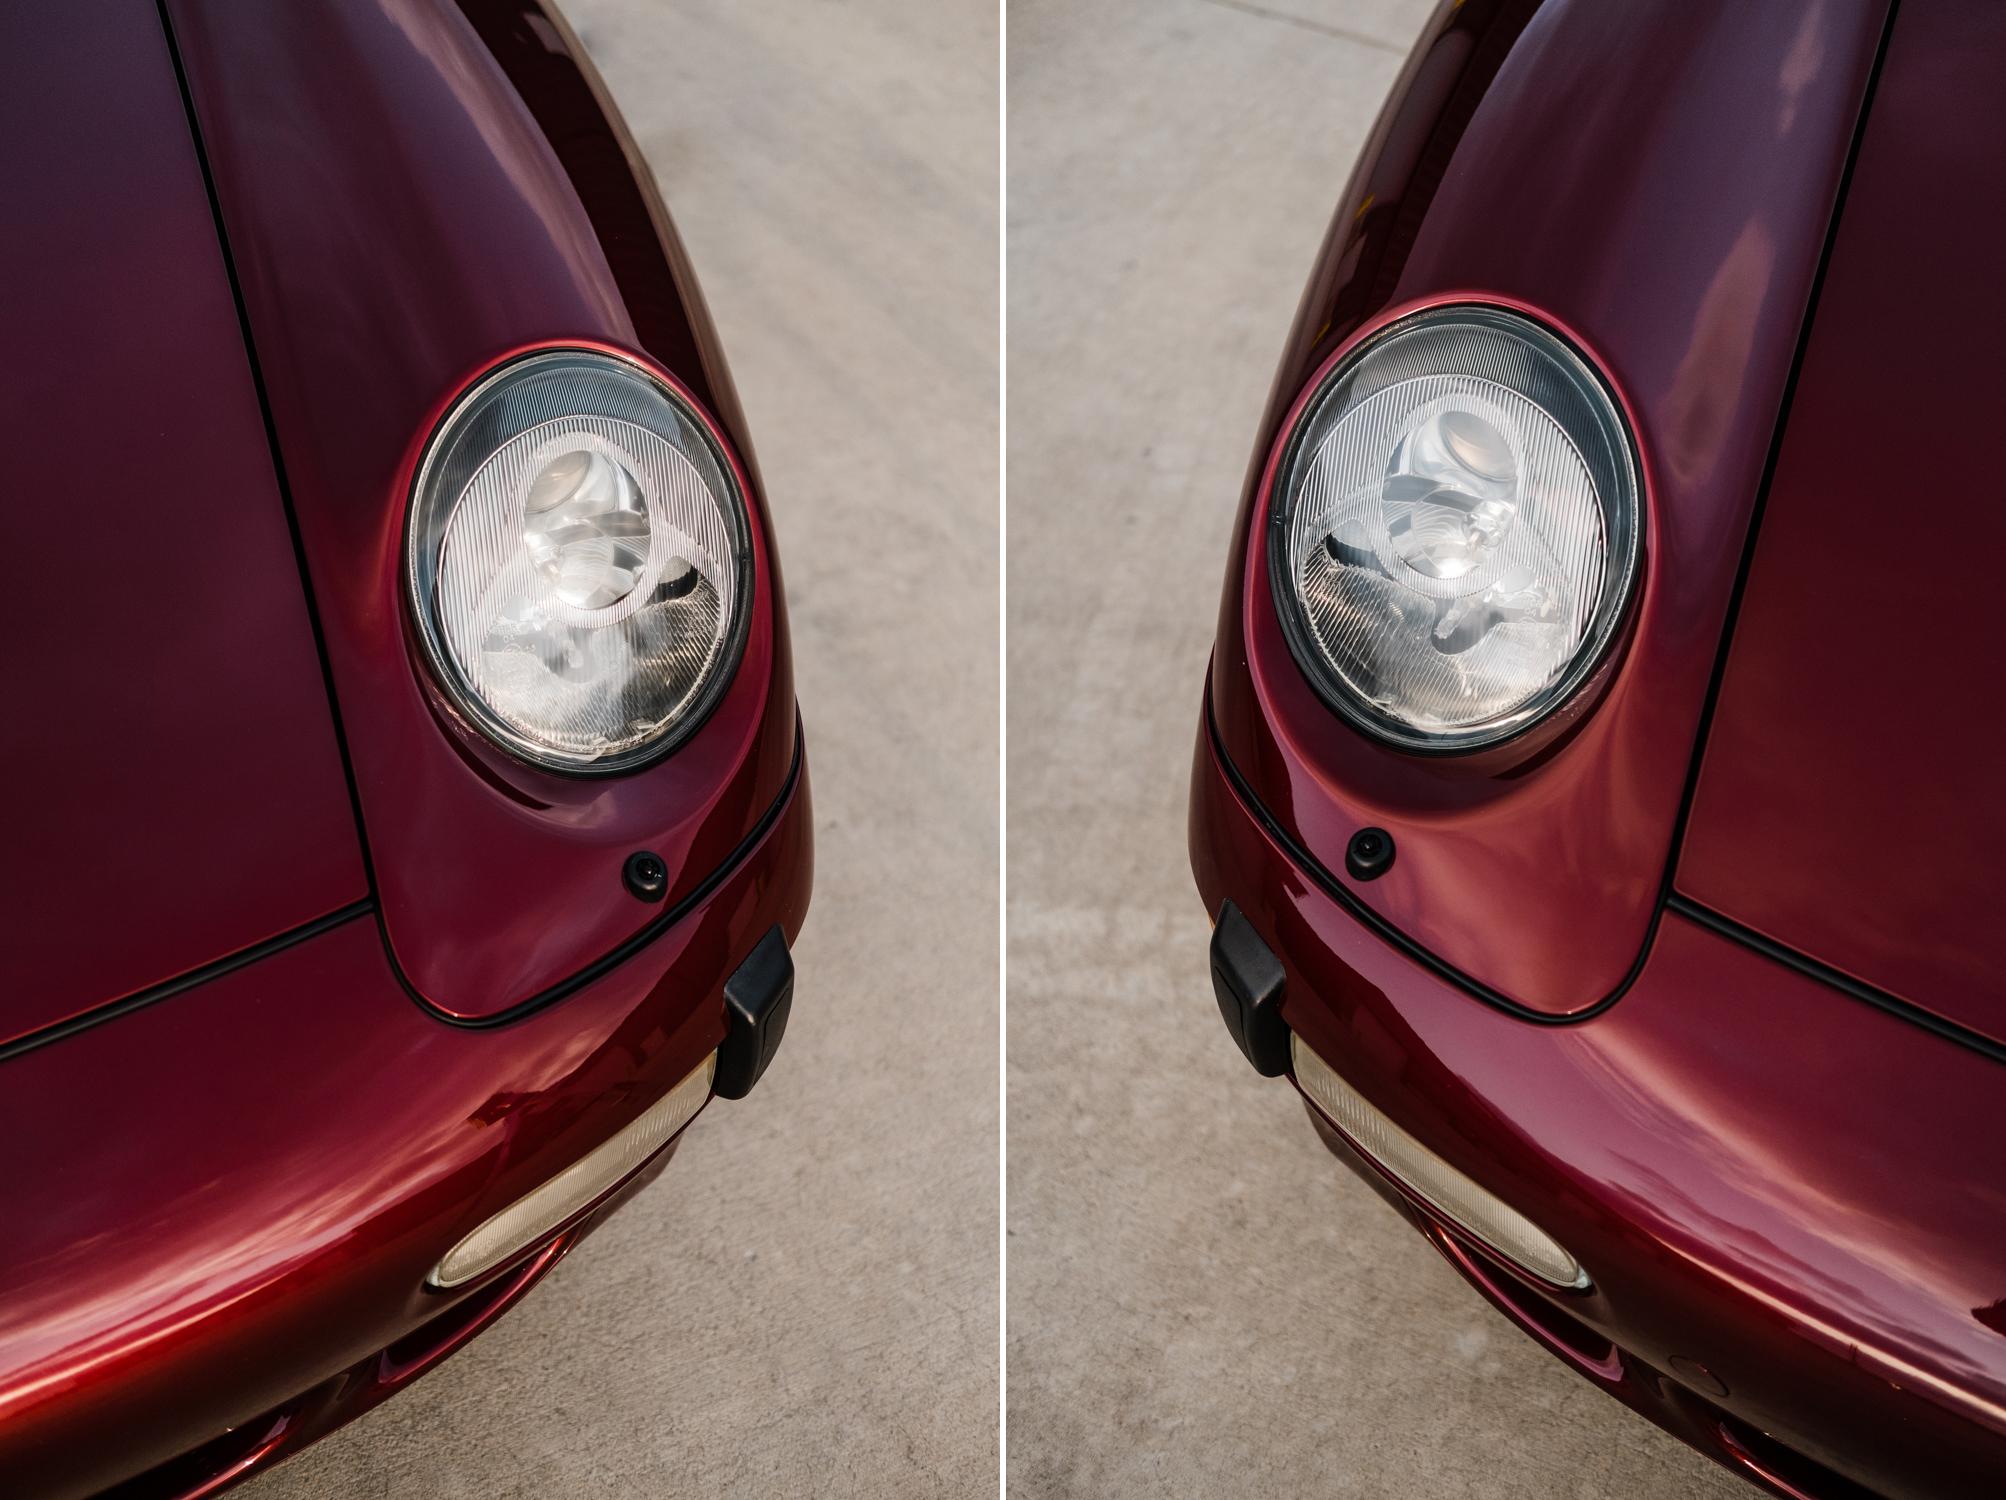 Porsche 911 Carrera 4S-Porsche 993-Porsche 911-Paint Correction-Car Wash-Car Detailing-210.jpg